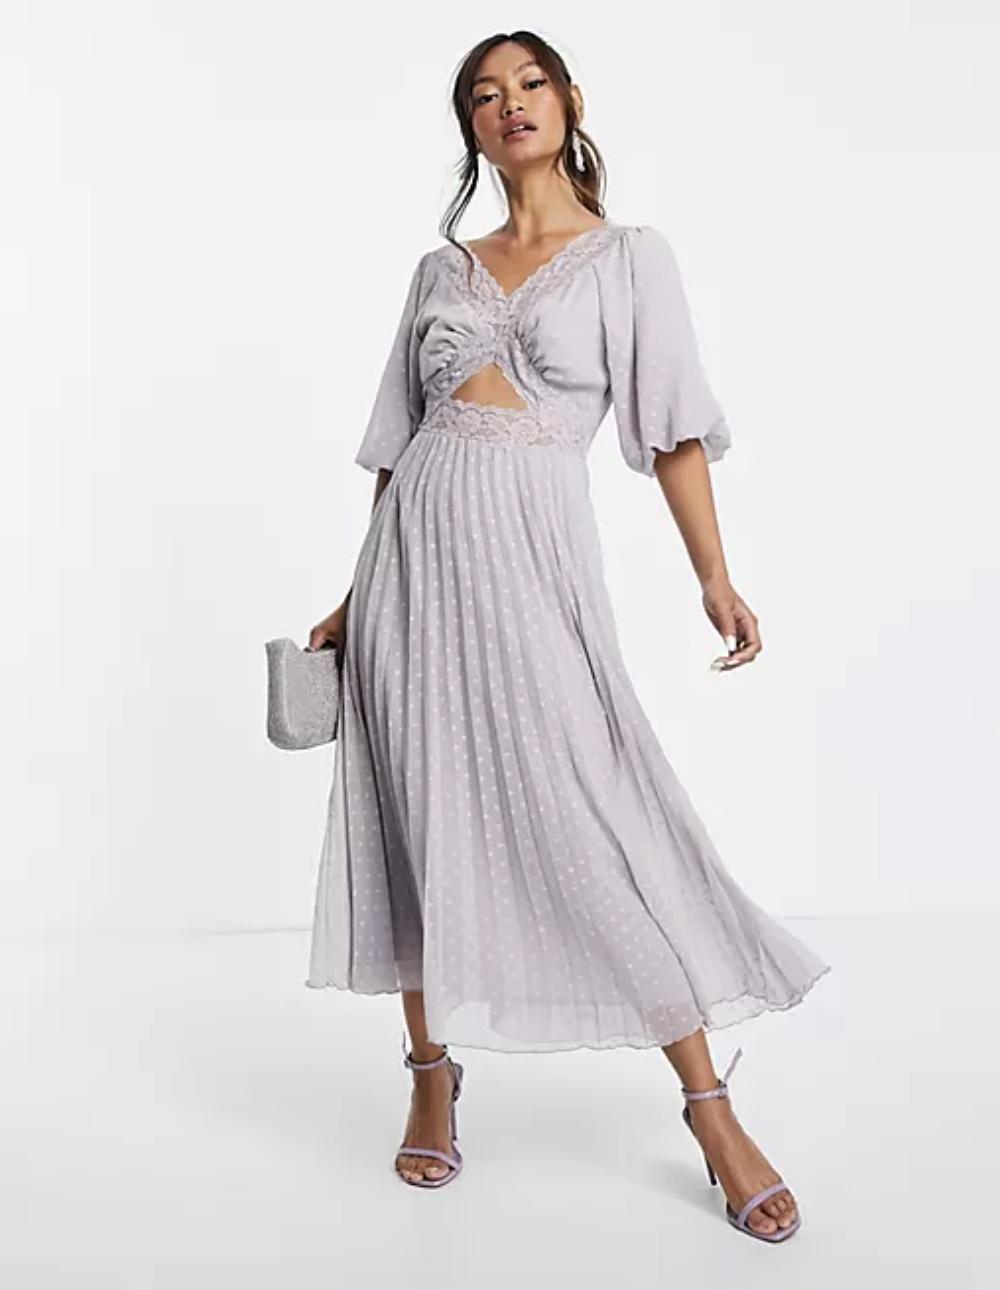 model wearing the lilac midi dress